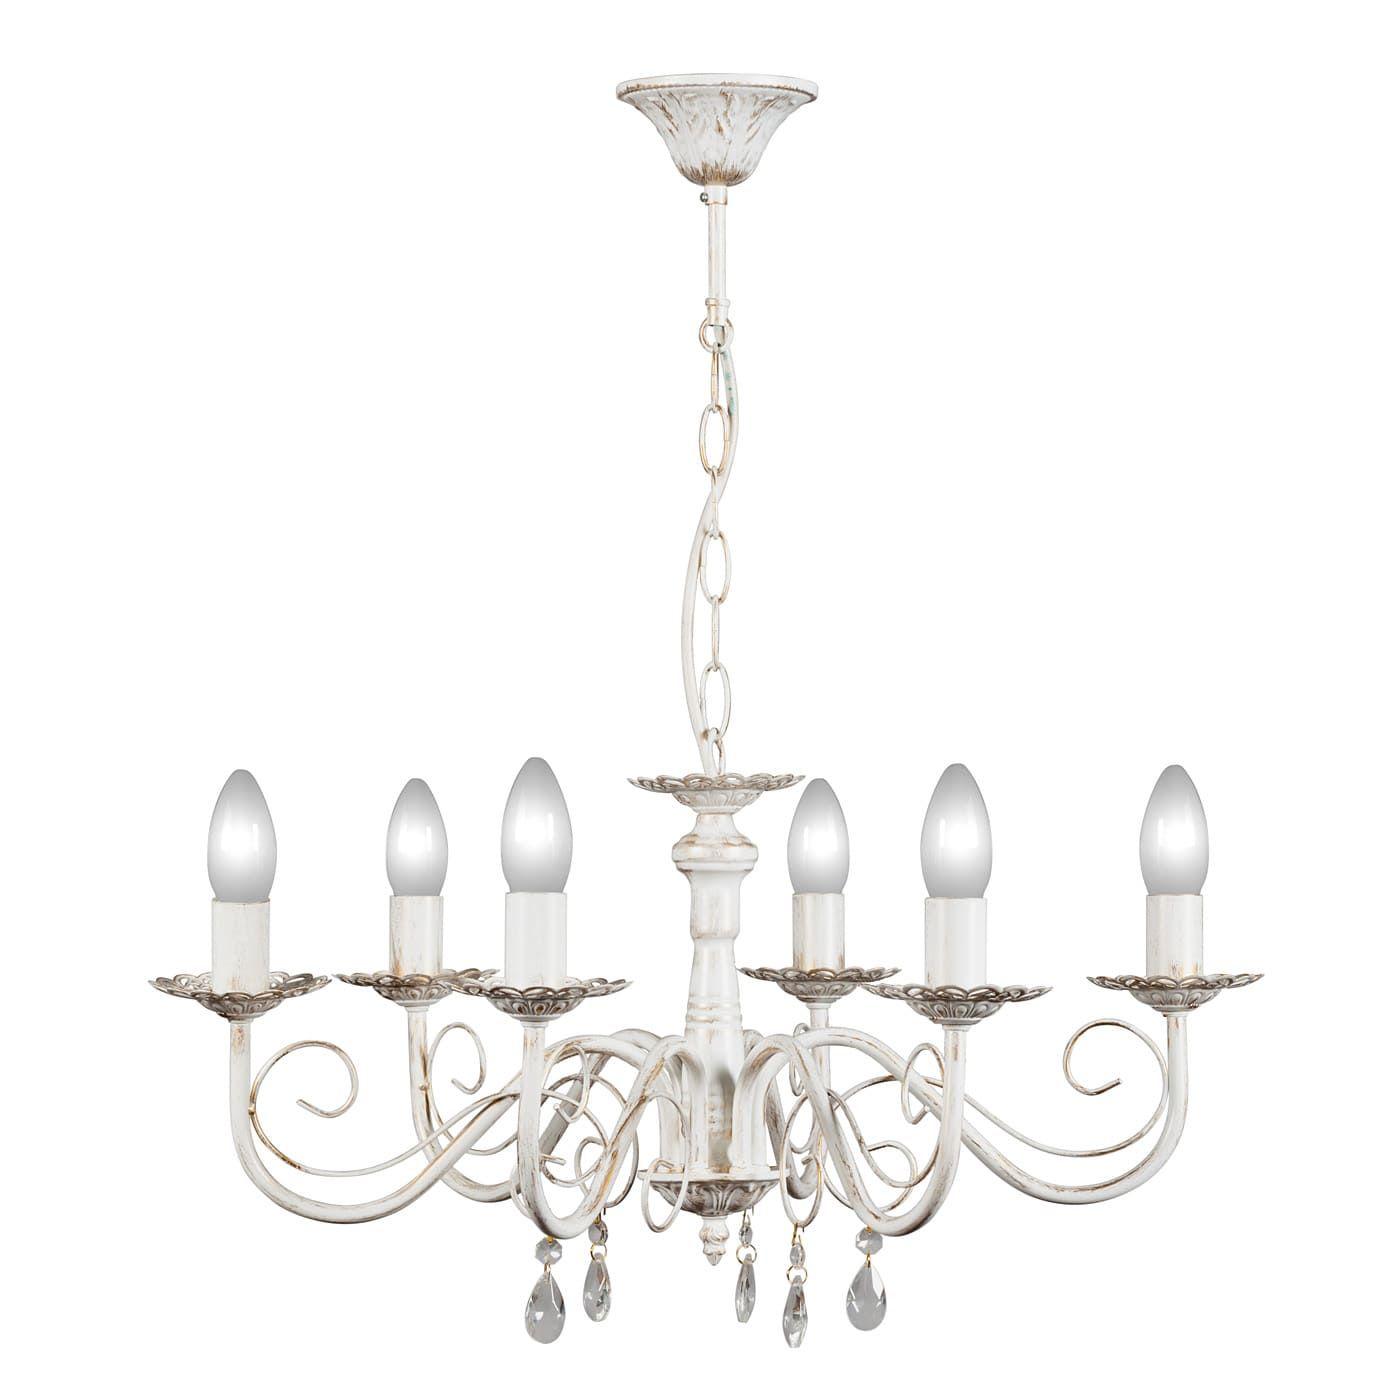 PETRASVET / Pendant chandelier S1019-6, 6xE14 max. 60W